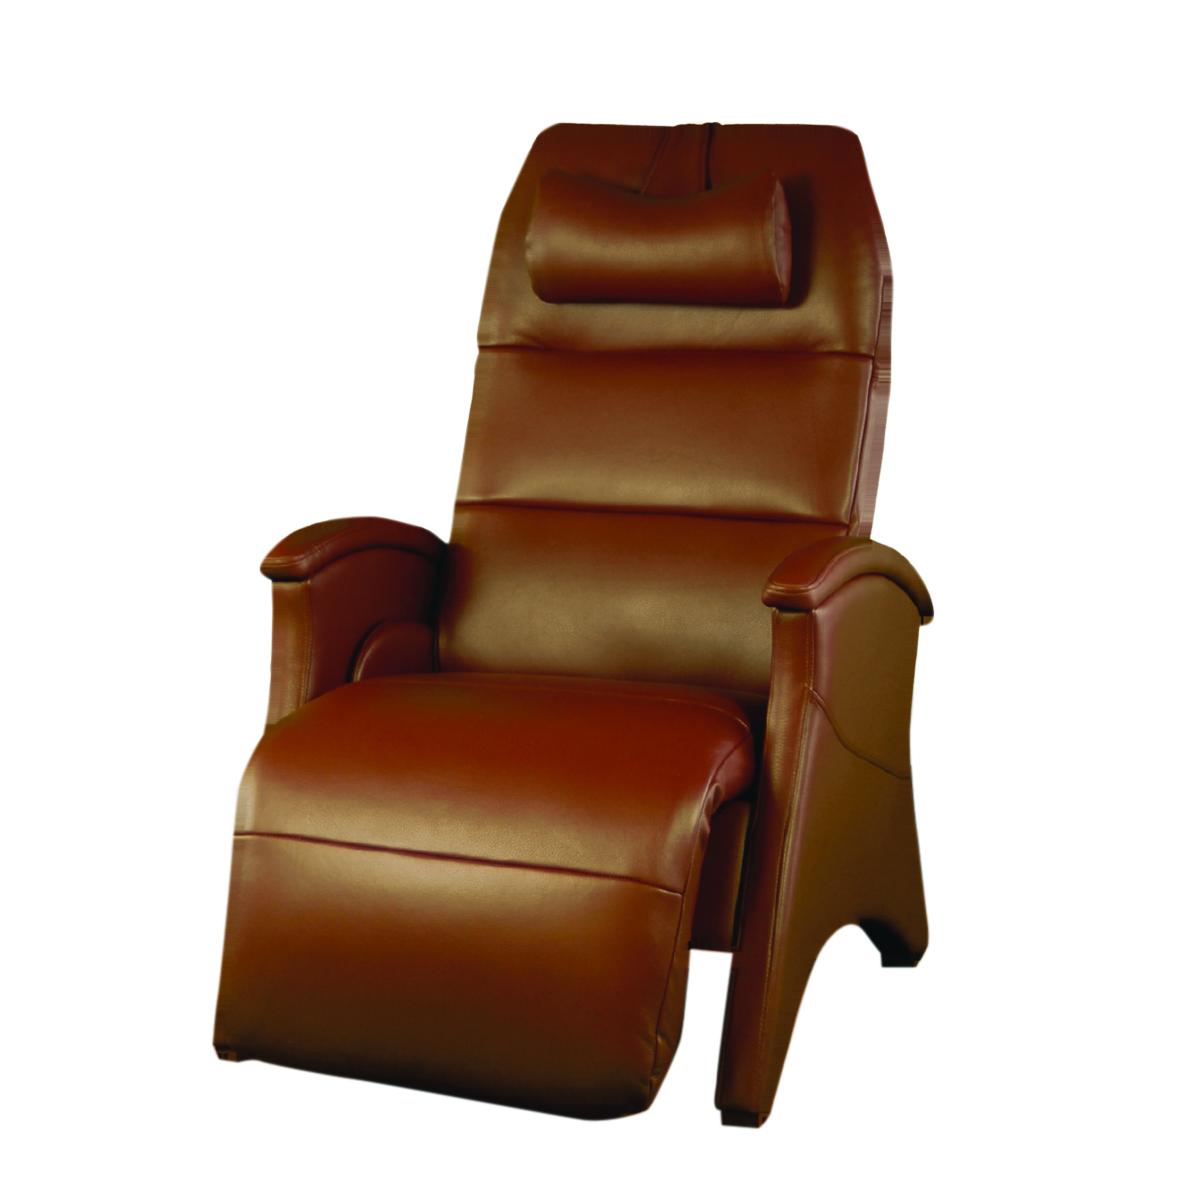 select-chair.jpg